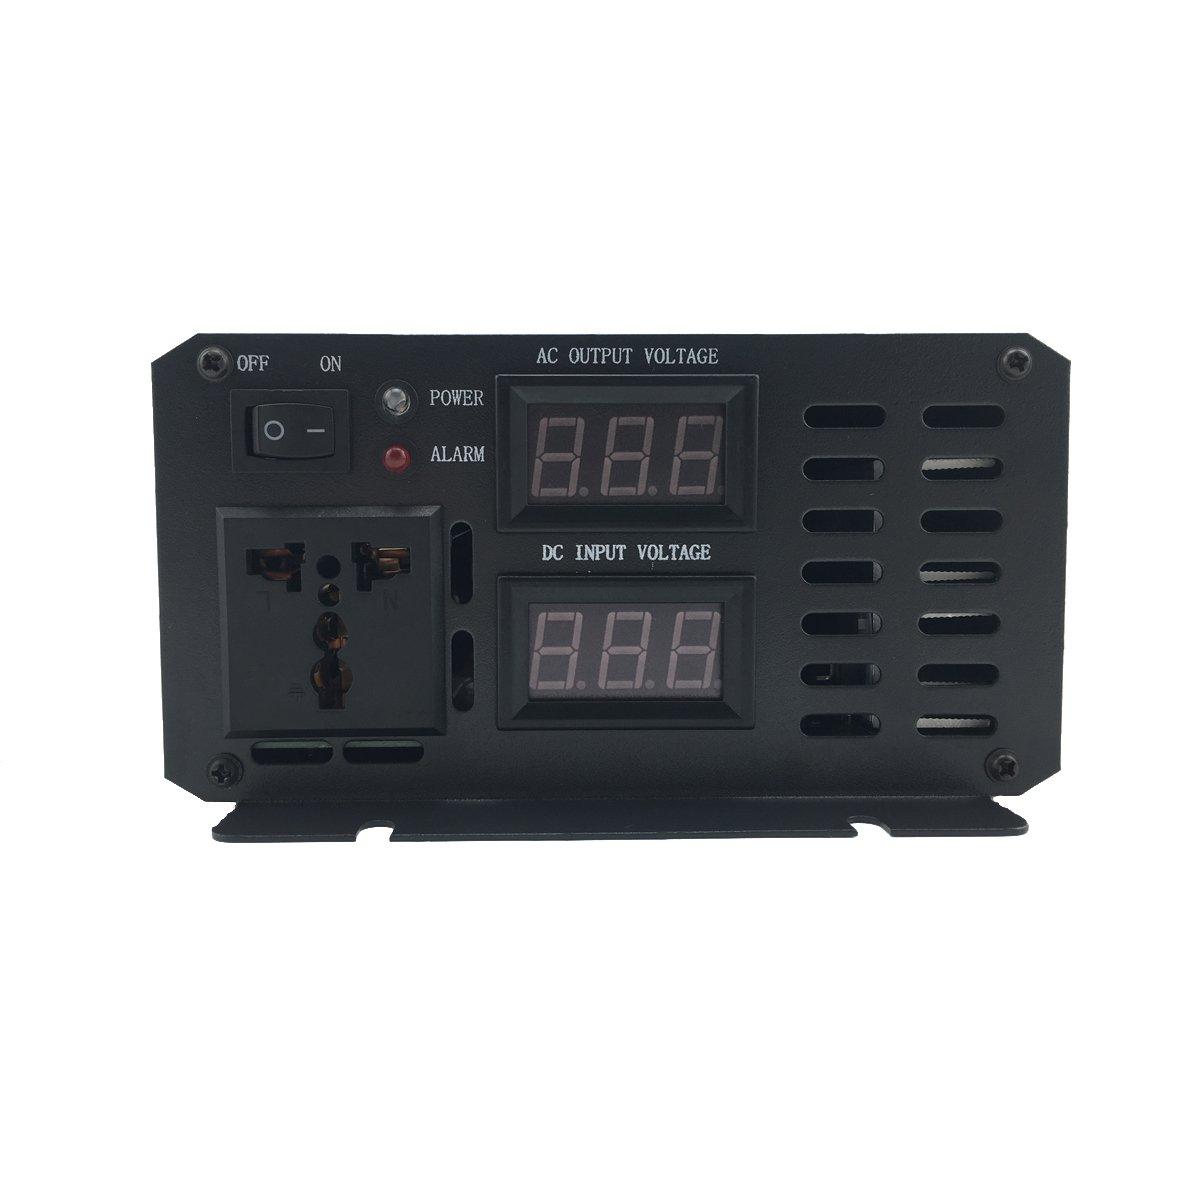 Xijia 1000W (Peak 2000W) Pure Sine Wave power Inverter DC 12V 24V 48V to AC 120V 60HZ Solar converter For Home Use car (DC 48V to AC 120V) by Xijia (Image #3)